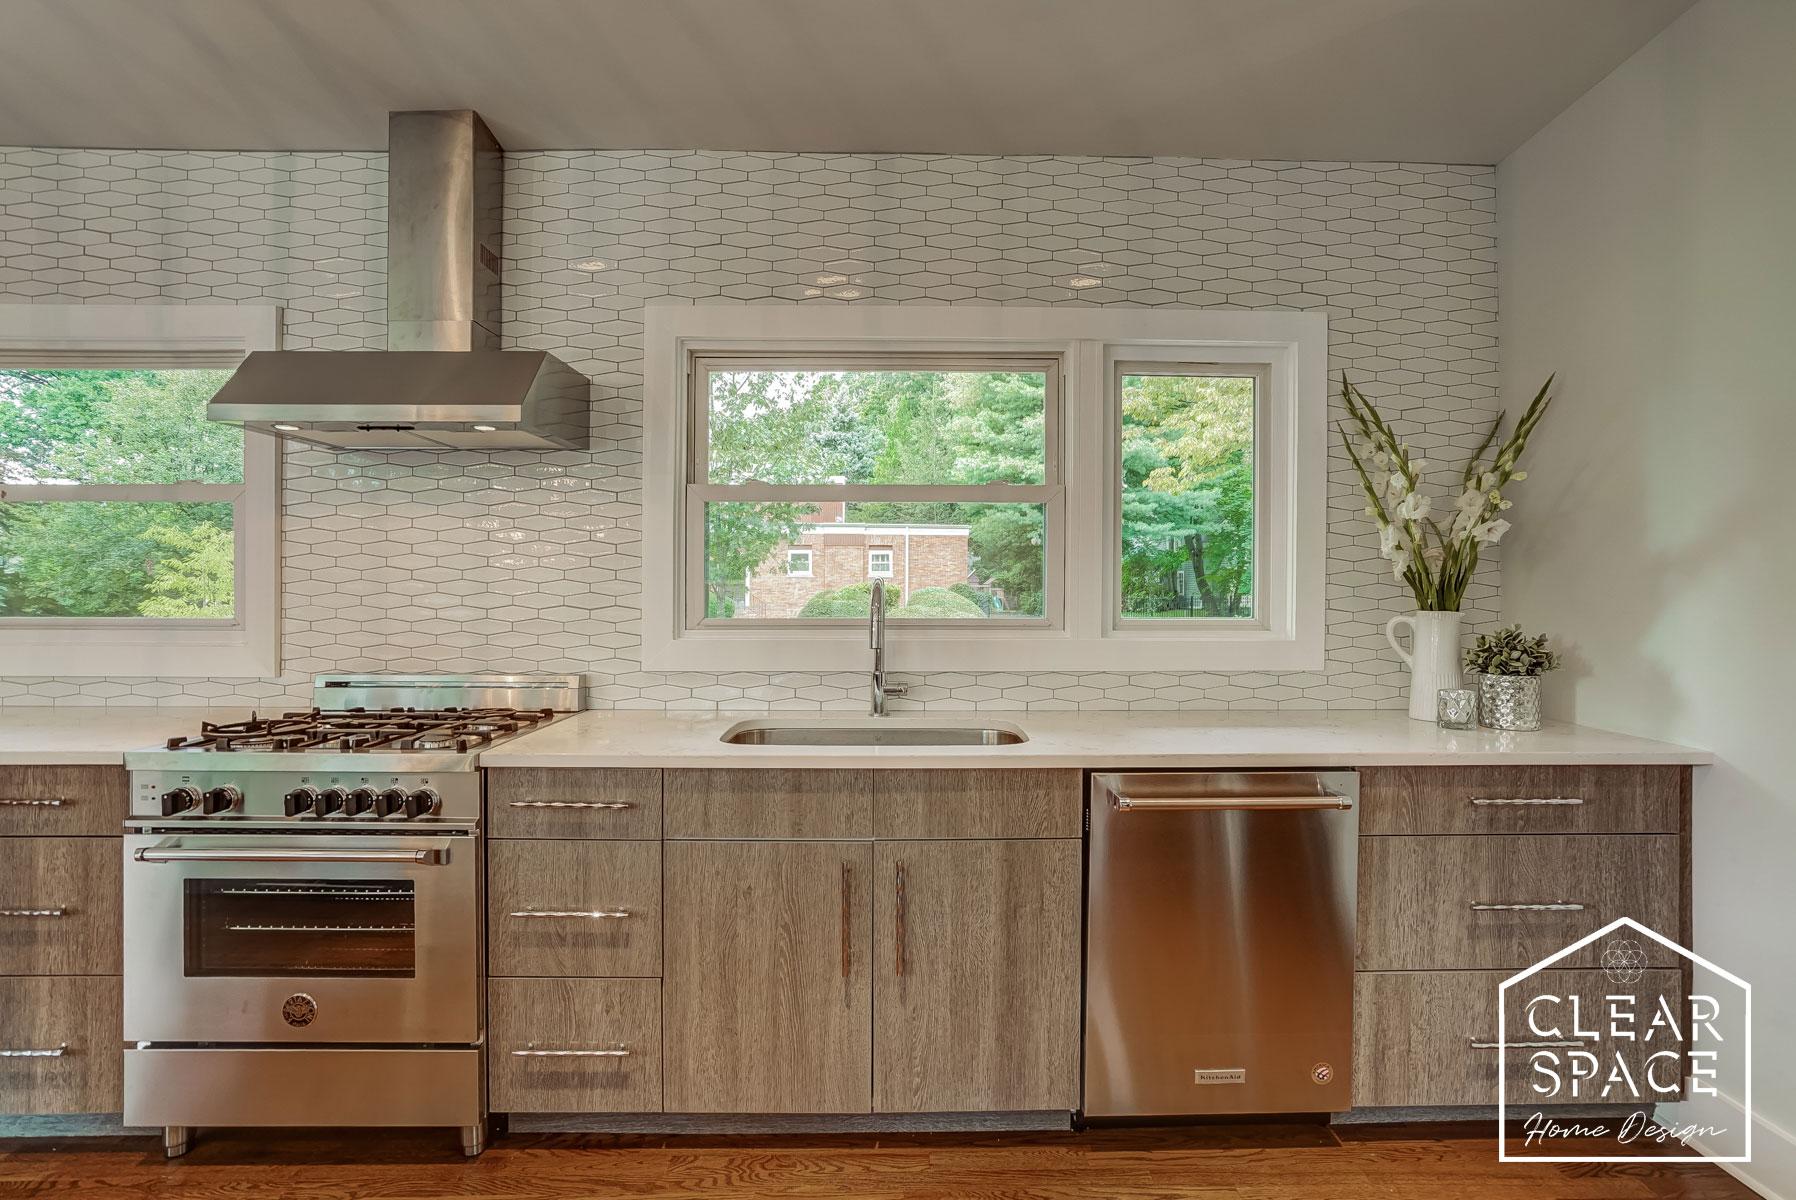 turrell_kitchen2.jpg